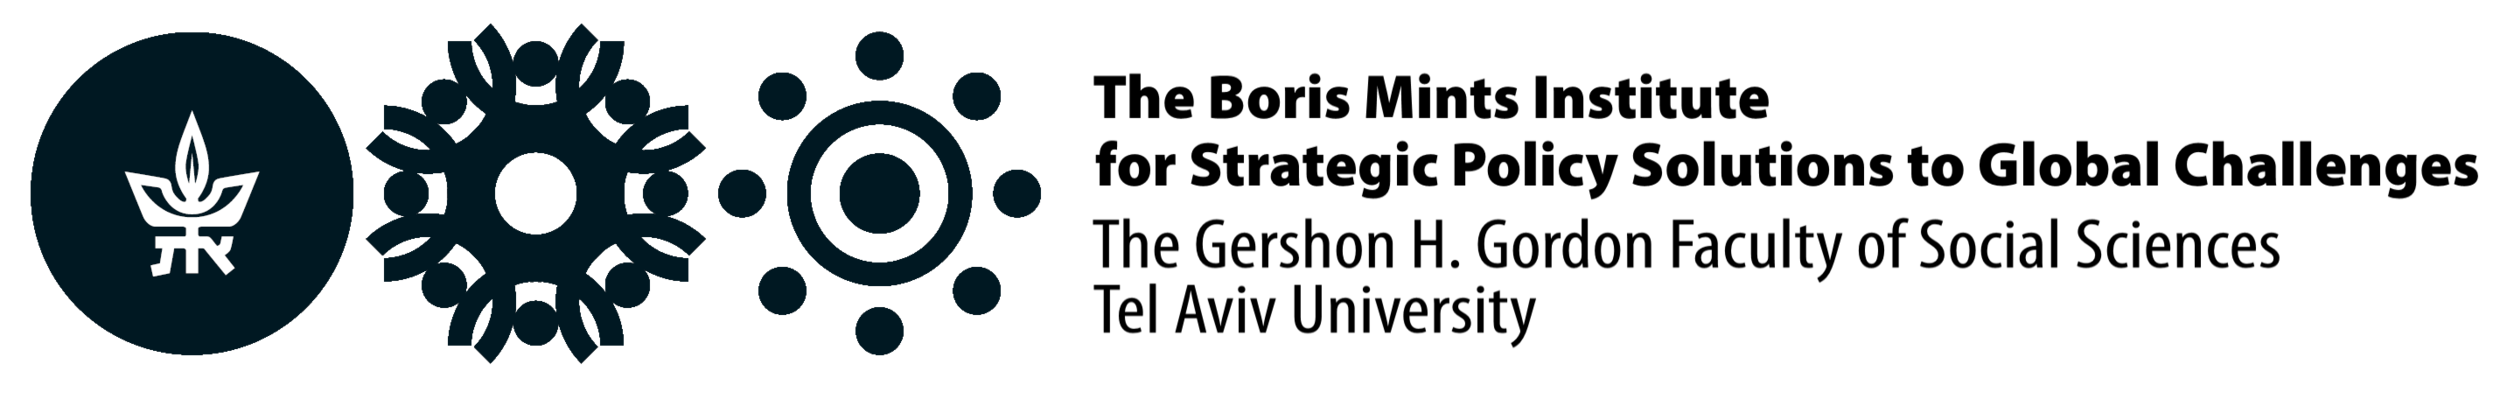 bmi_logo_hd_long_transp.png